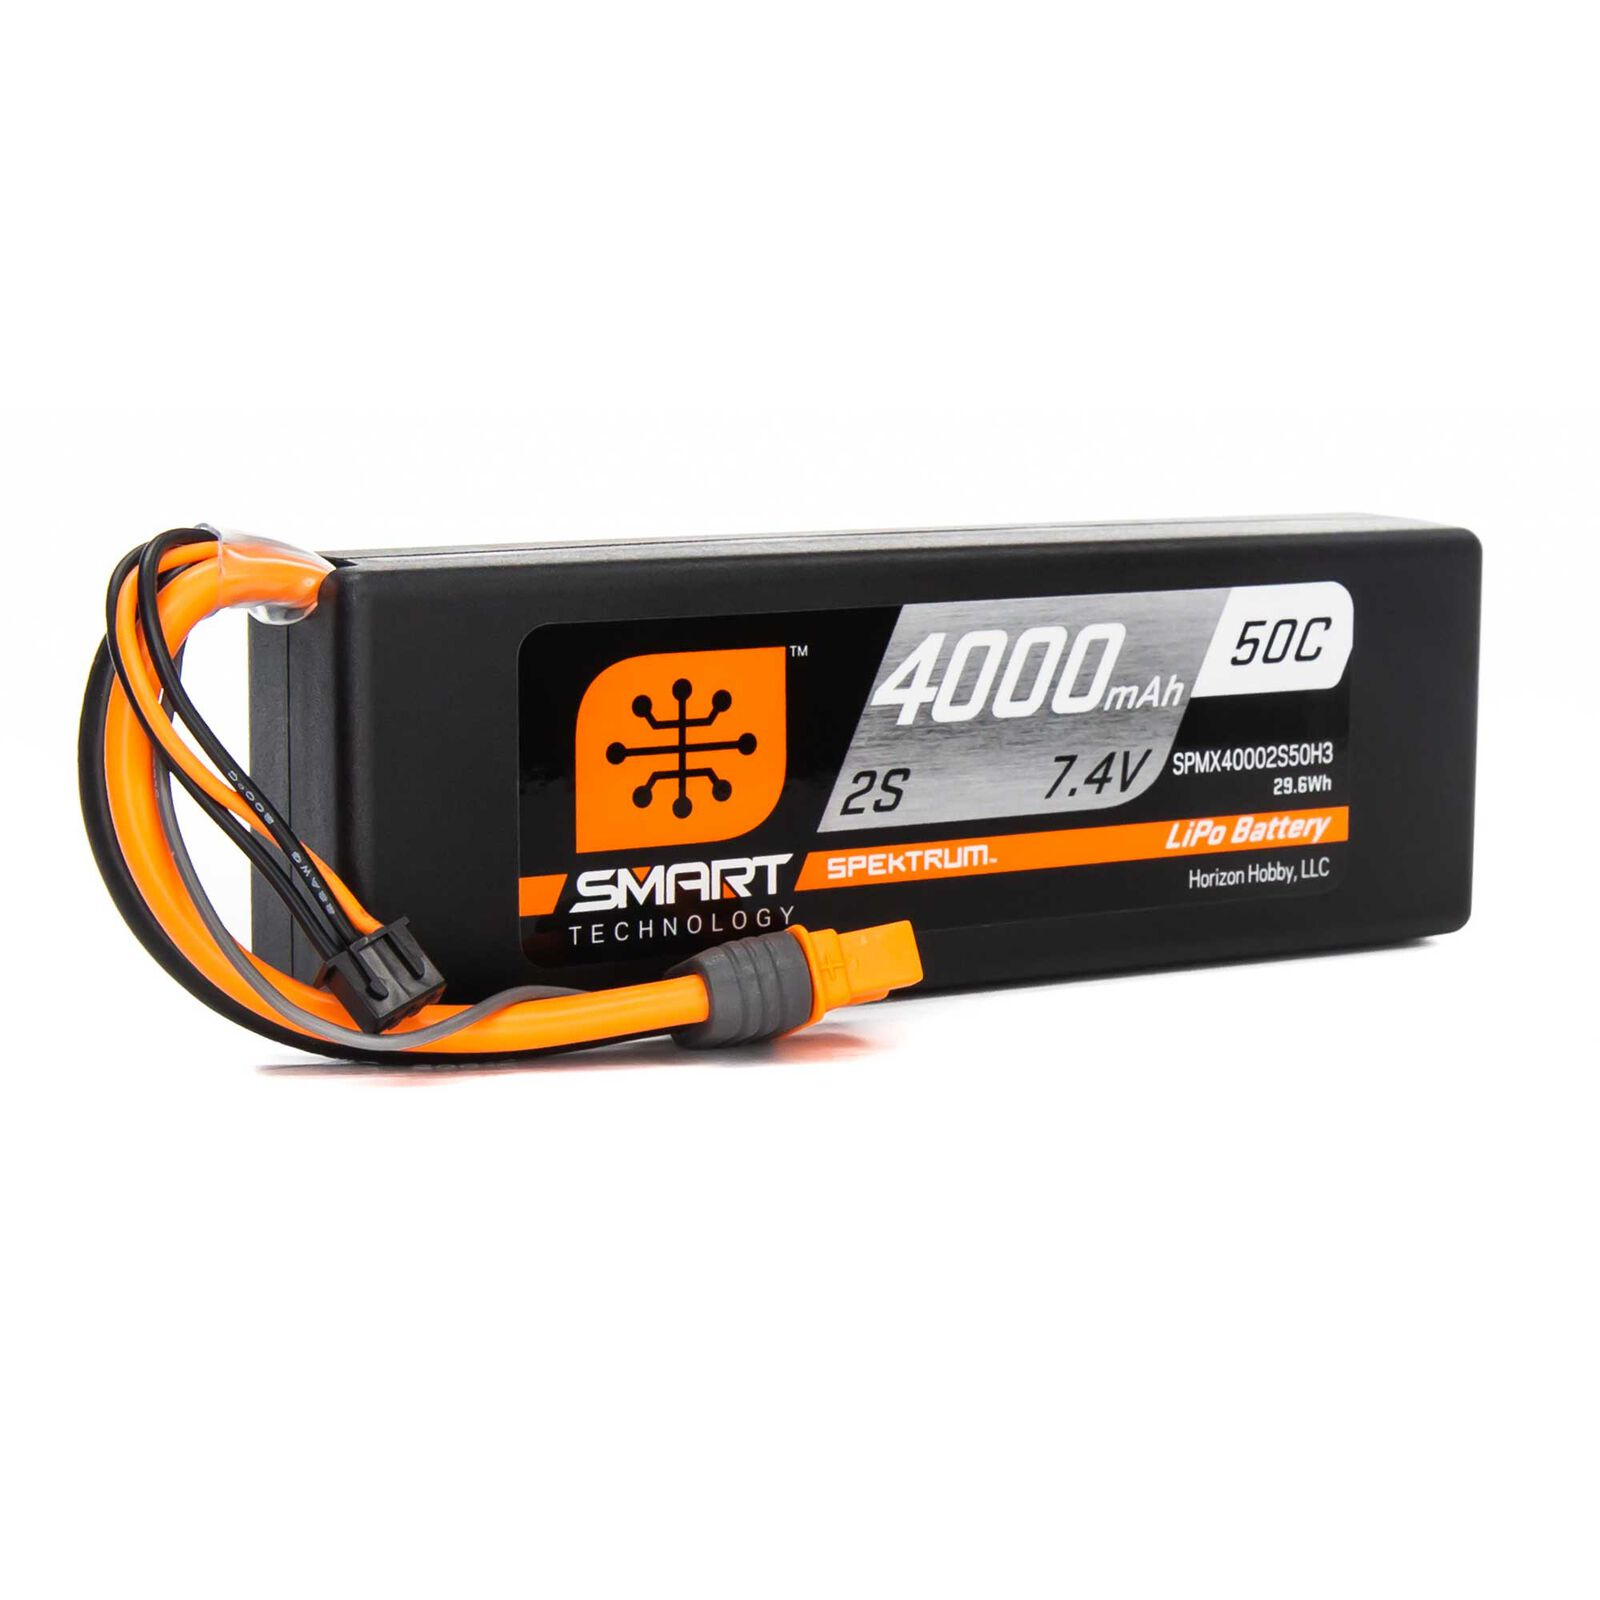 7.4V 4000mAh 2S 50C Smart LiPo Battery, IC3